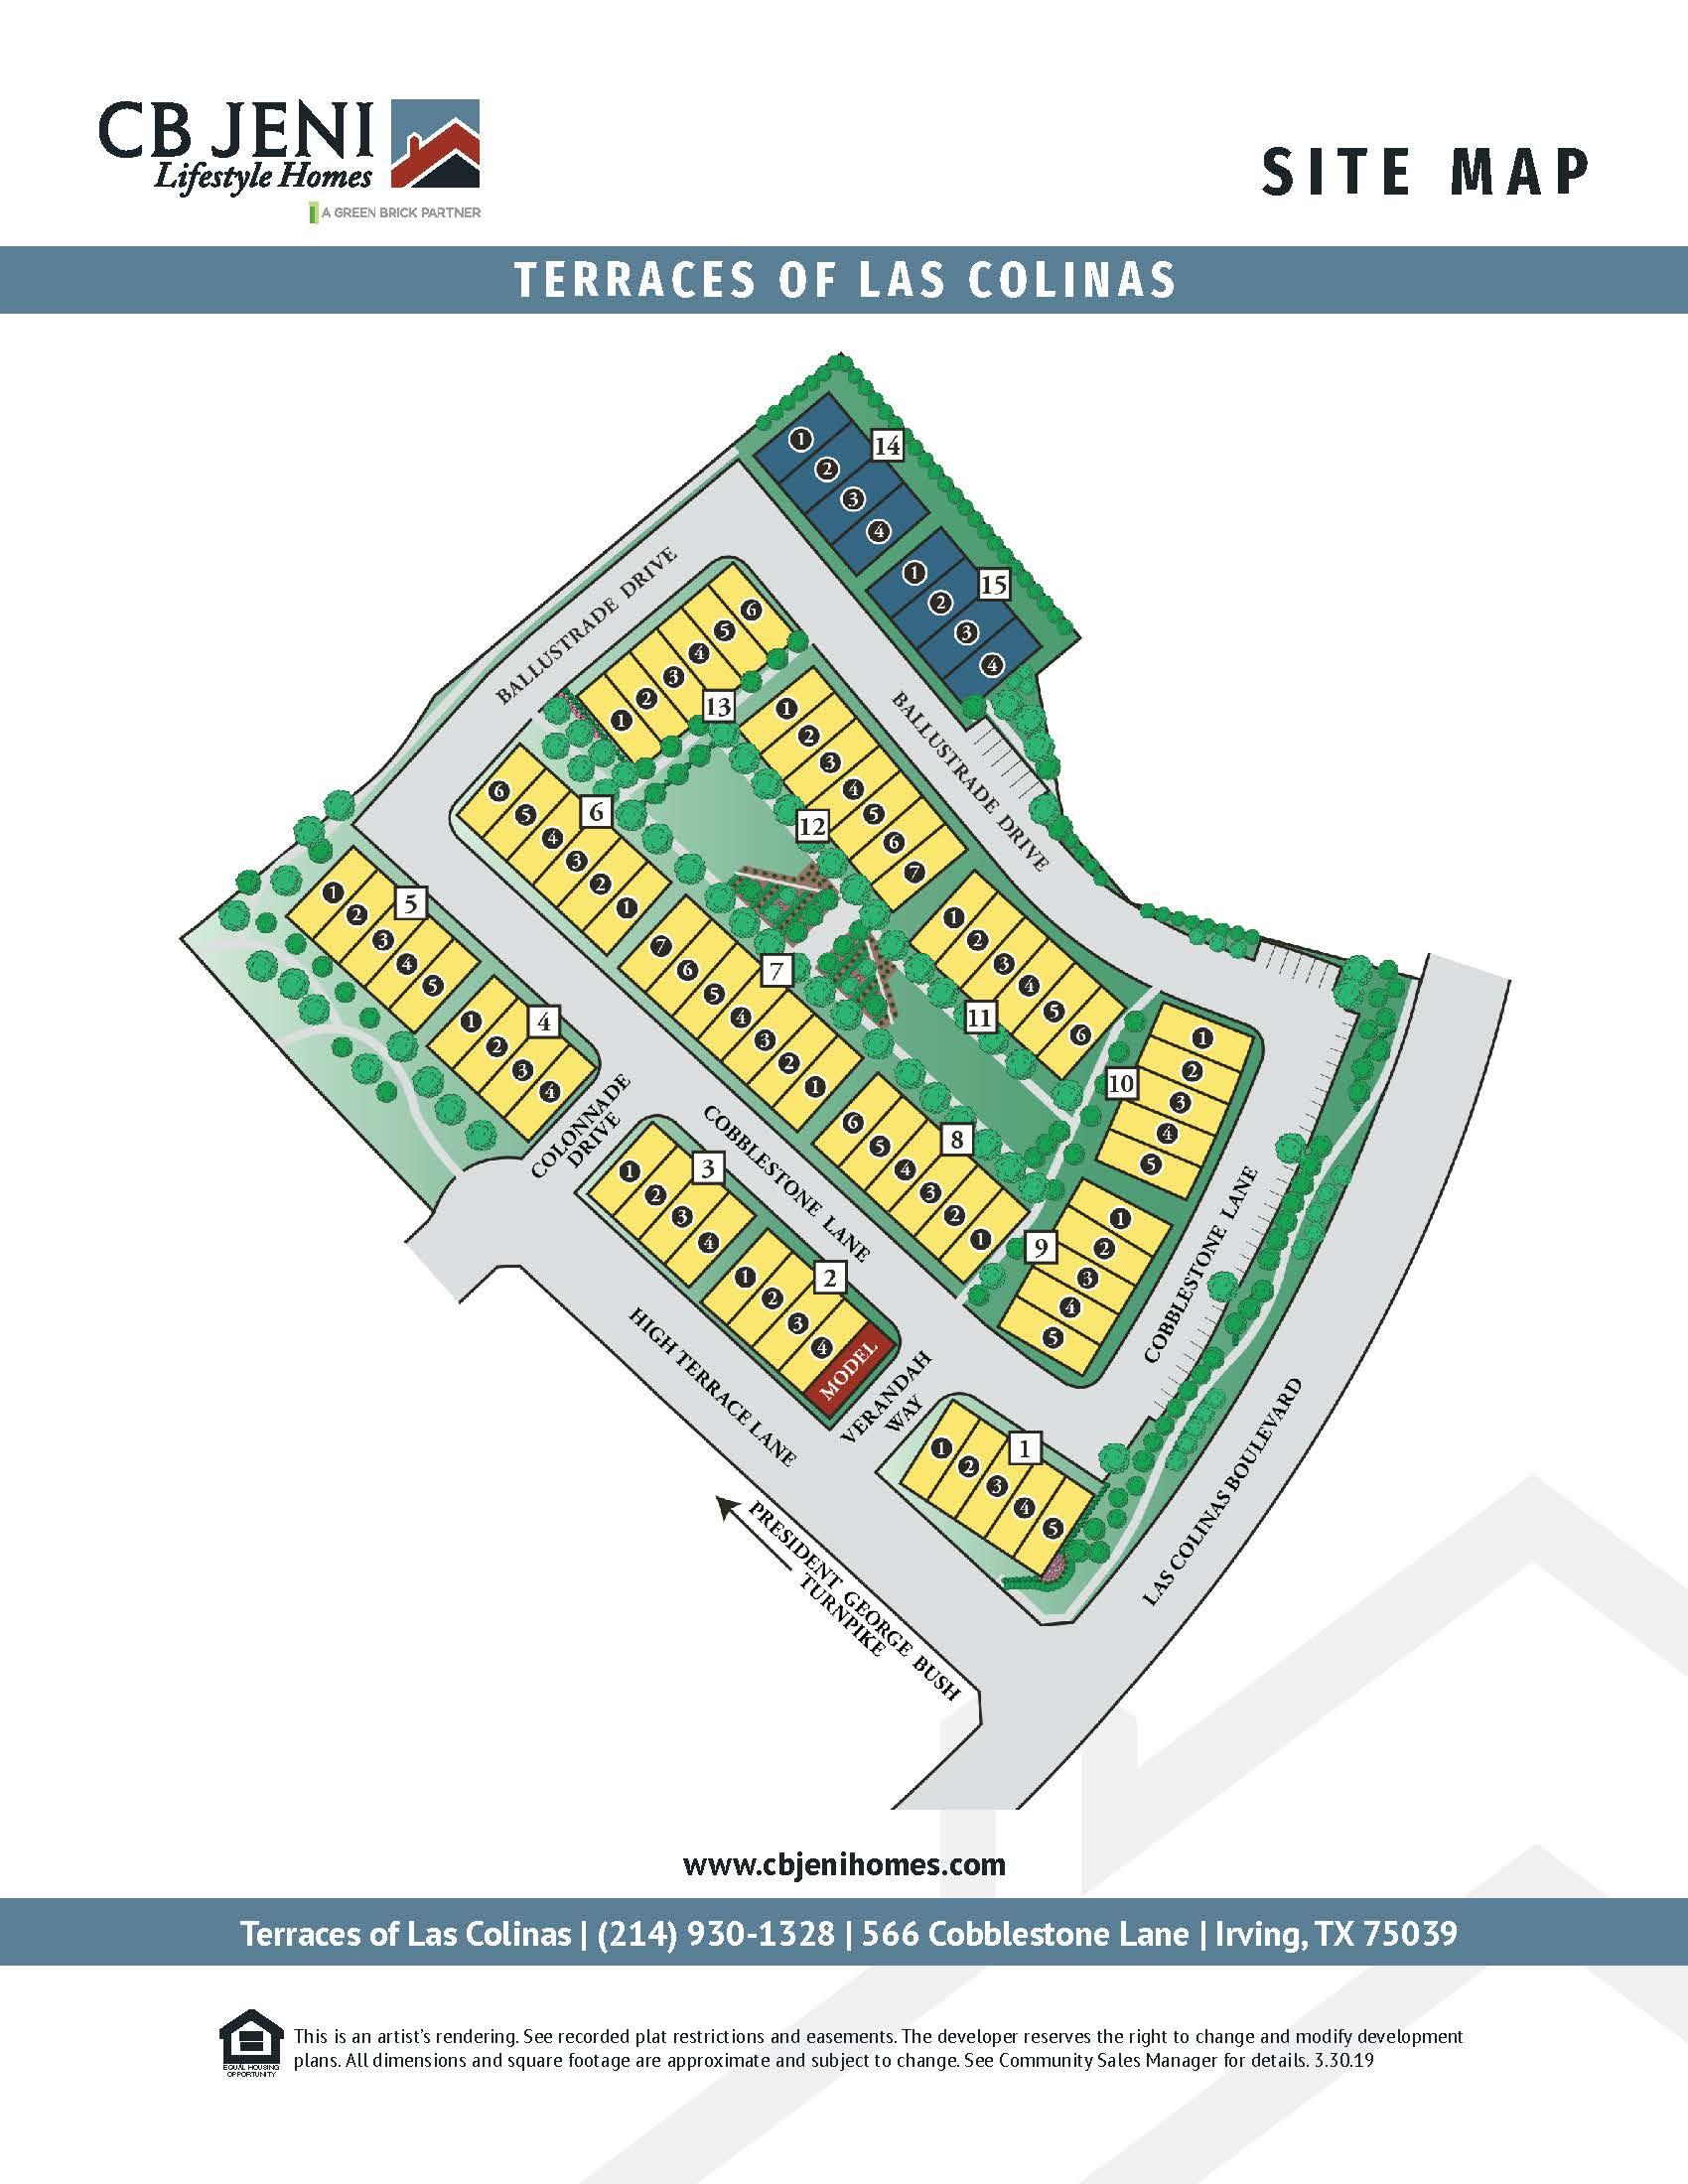 Terraces of Las Colinas Site Map